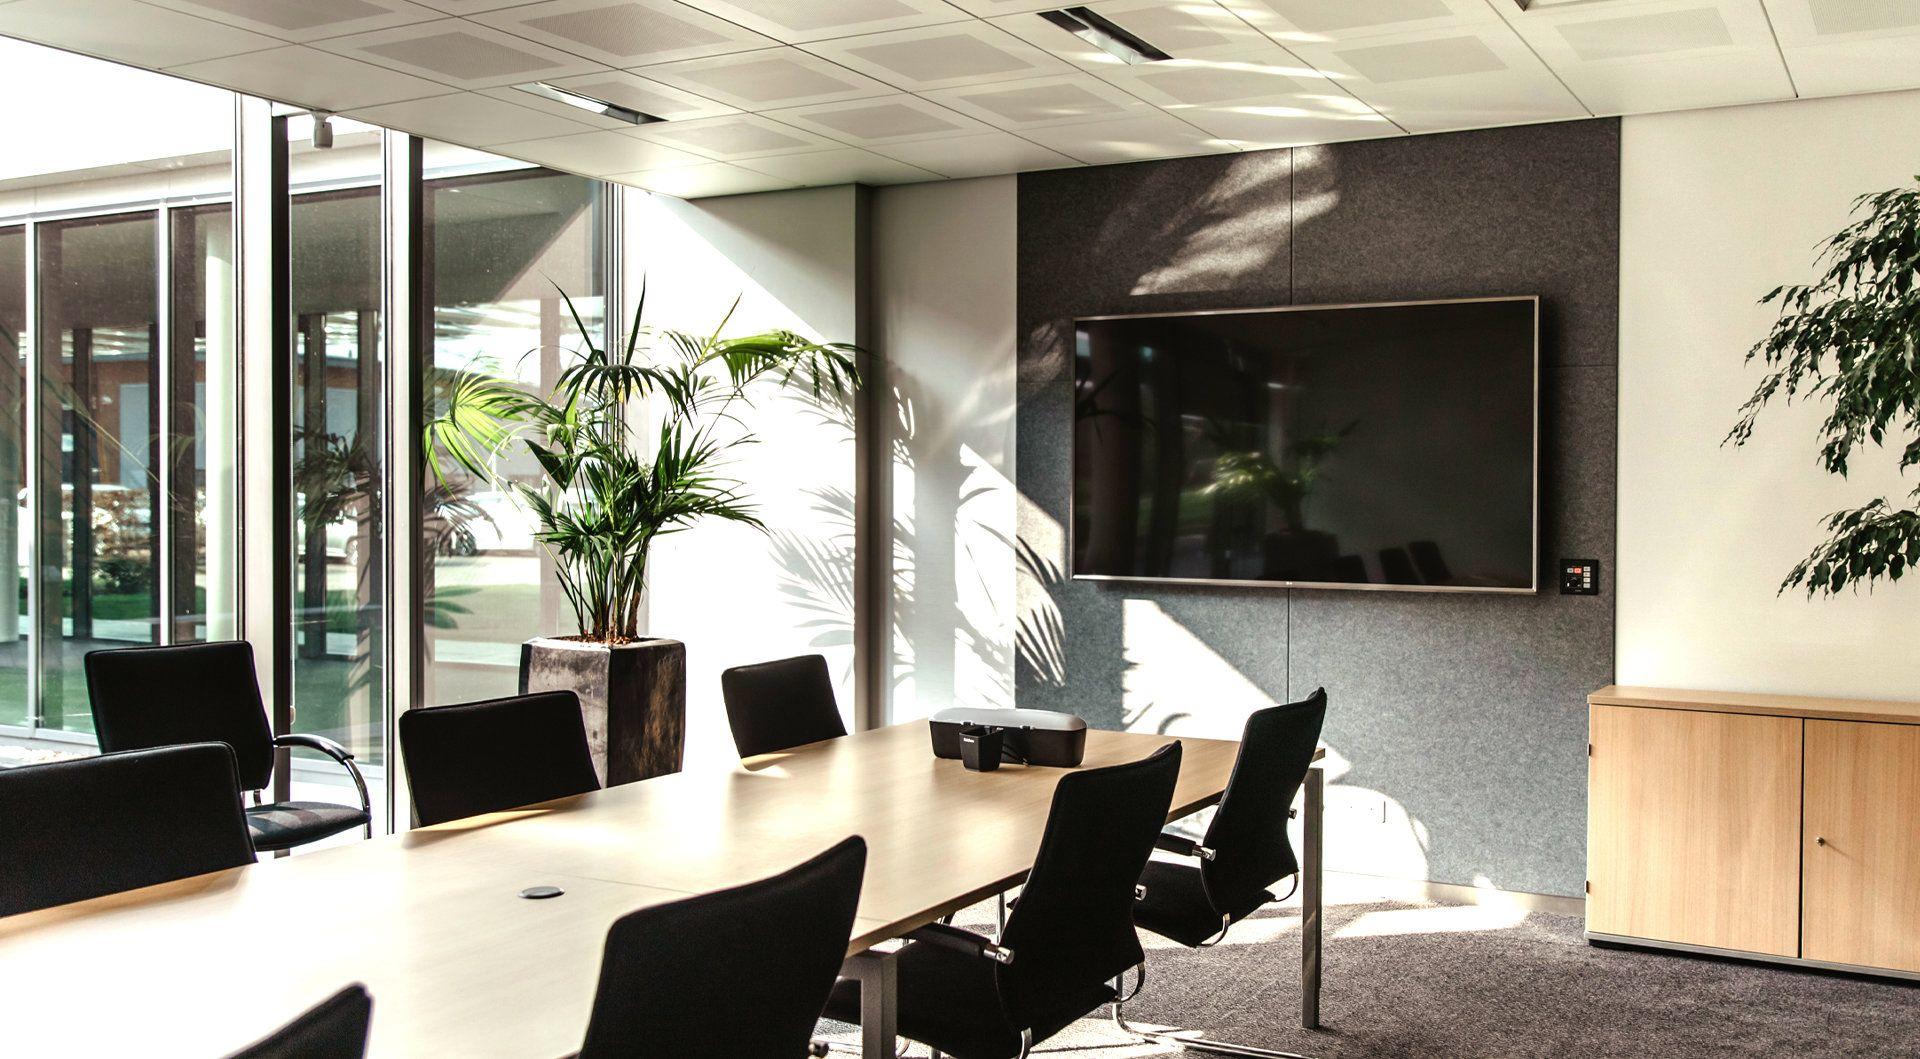 Prowise PW.1.21005.0003 flat panel vloer standaard Draagbare flatscreen vloerstandaard Zwart, Grijs - Case studie de vries